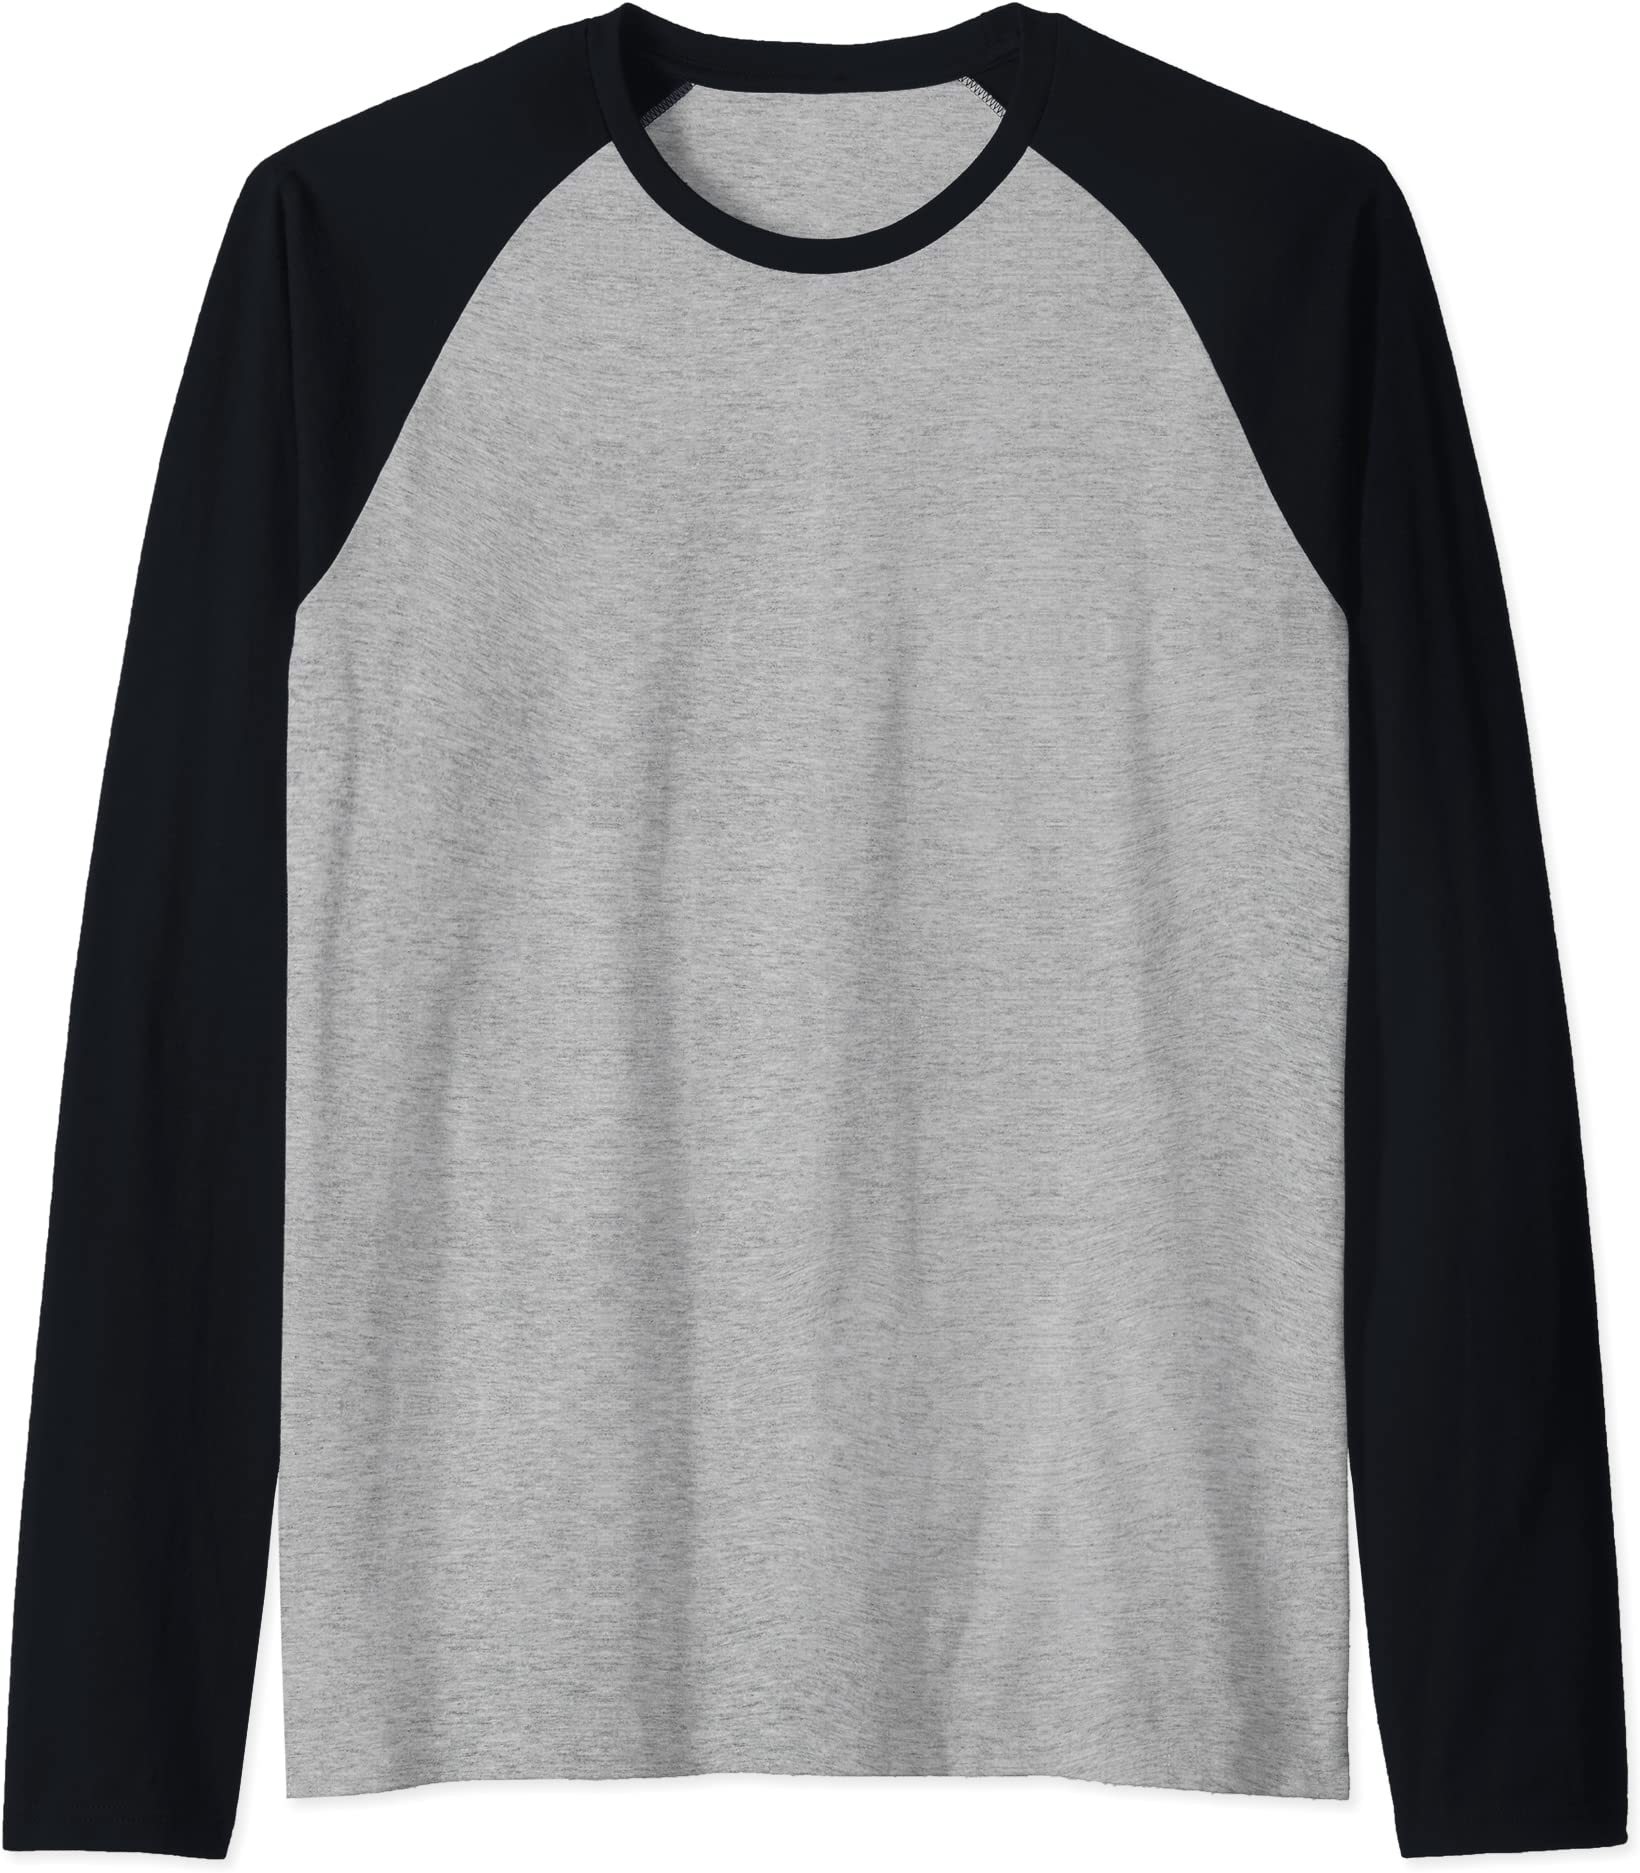 NCAA Delaware State Hornets PPDEU01 Toddler Long-Sleeve T-Shirt